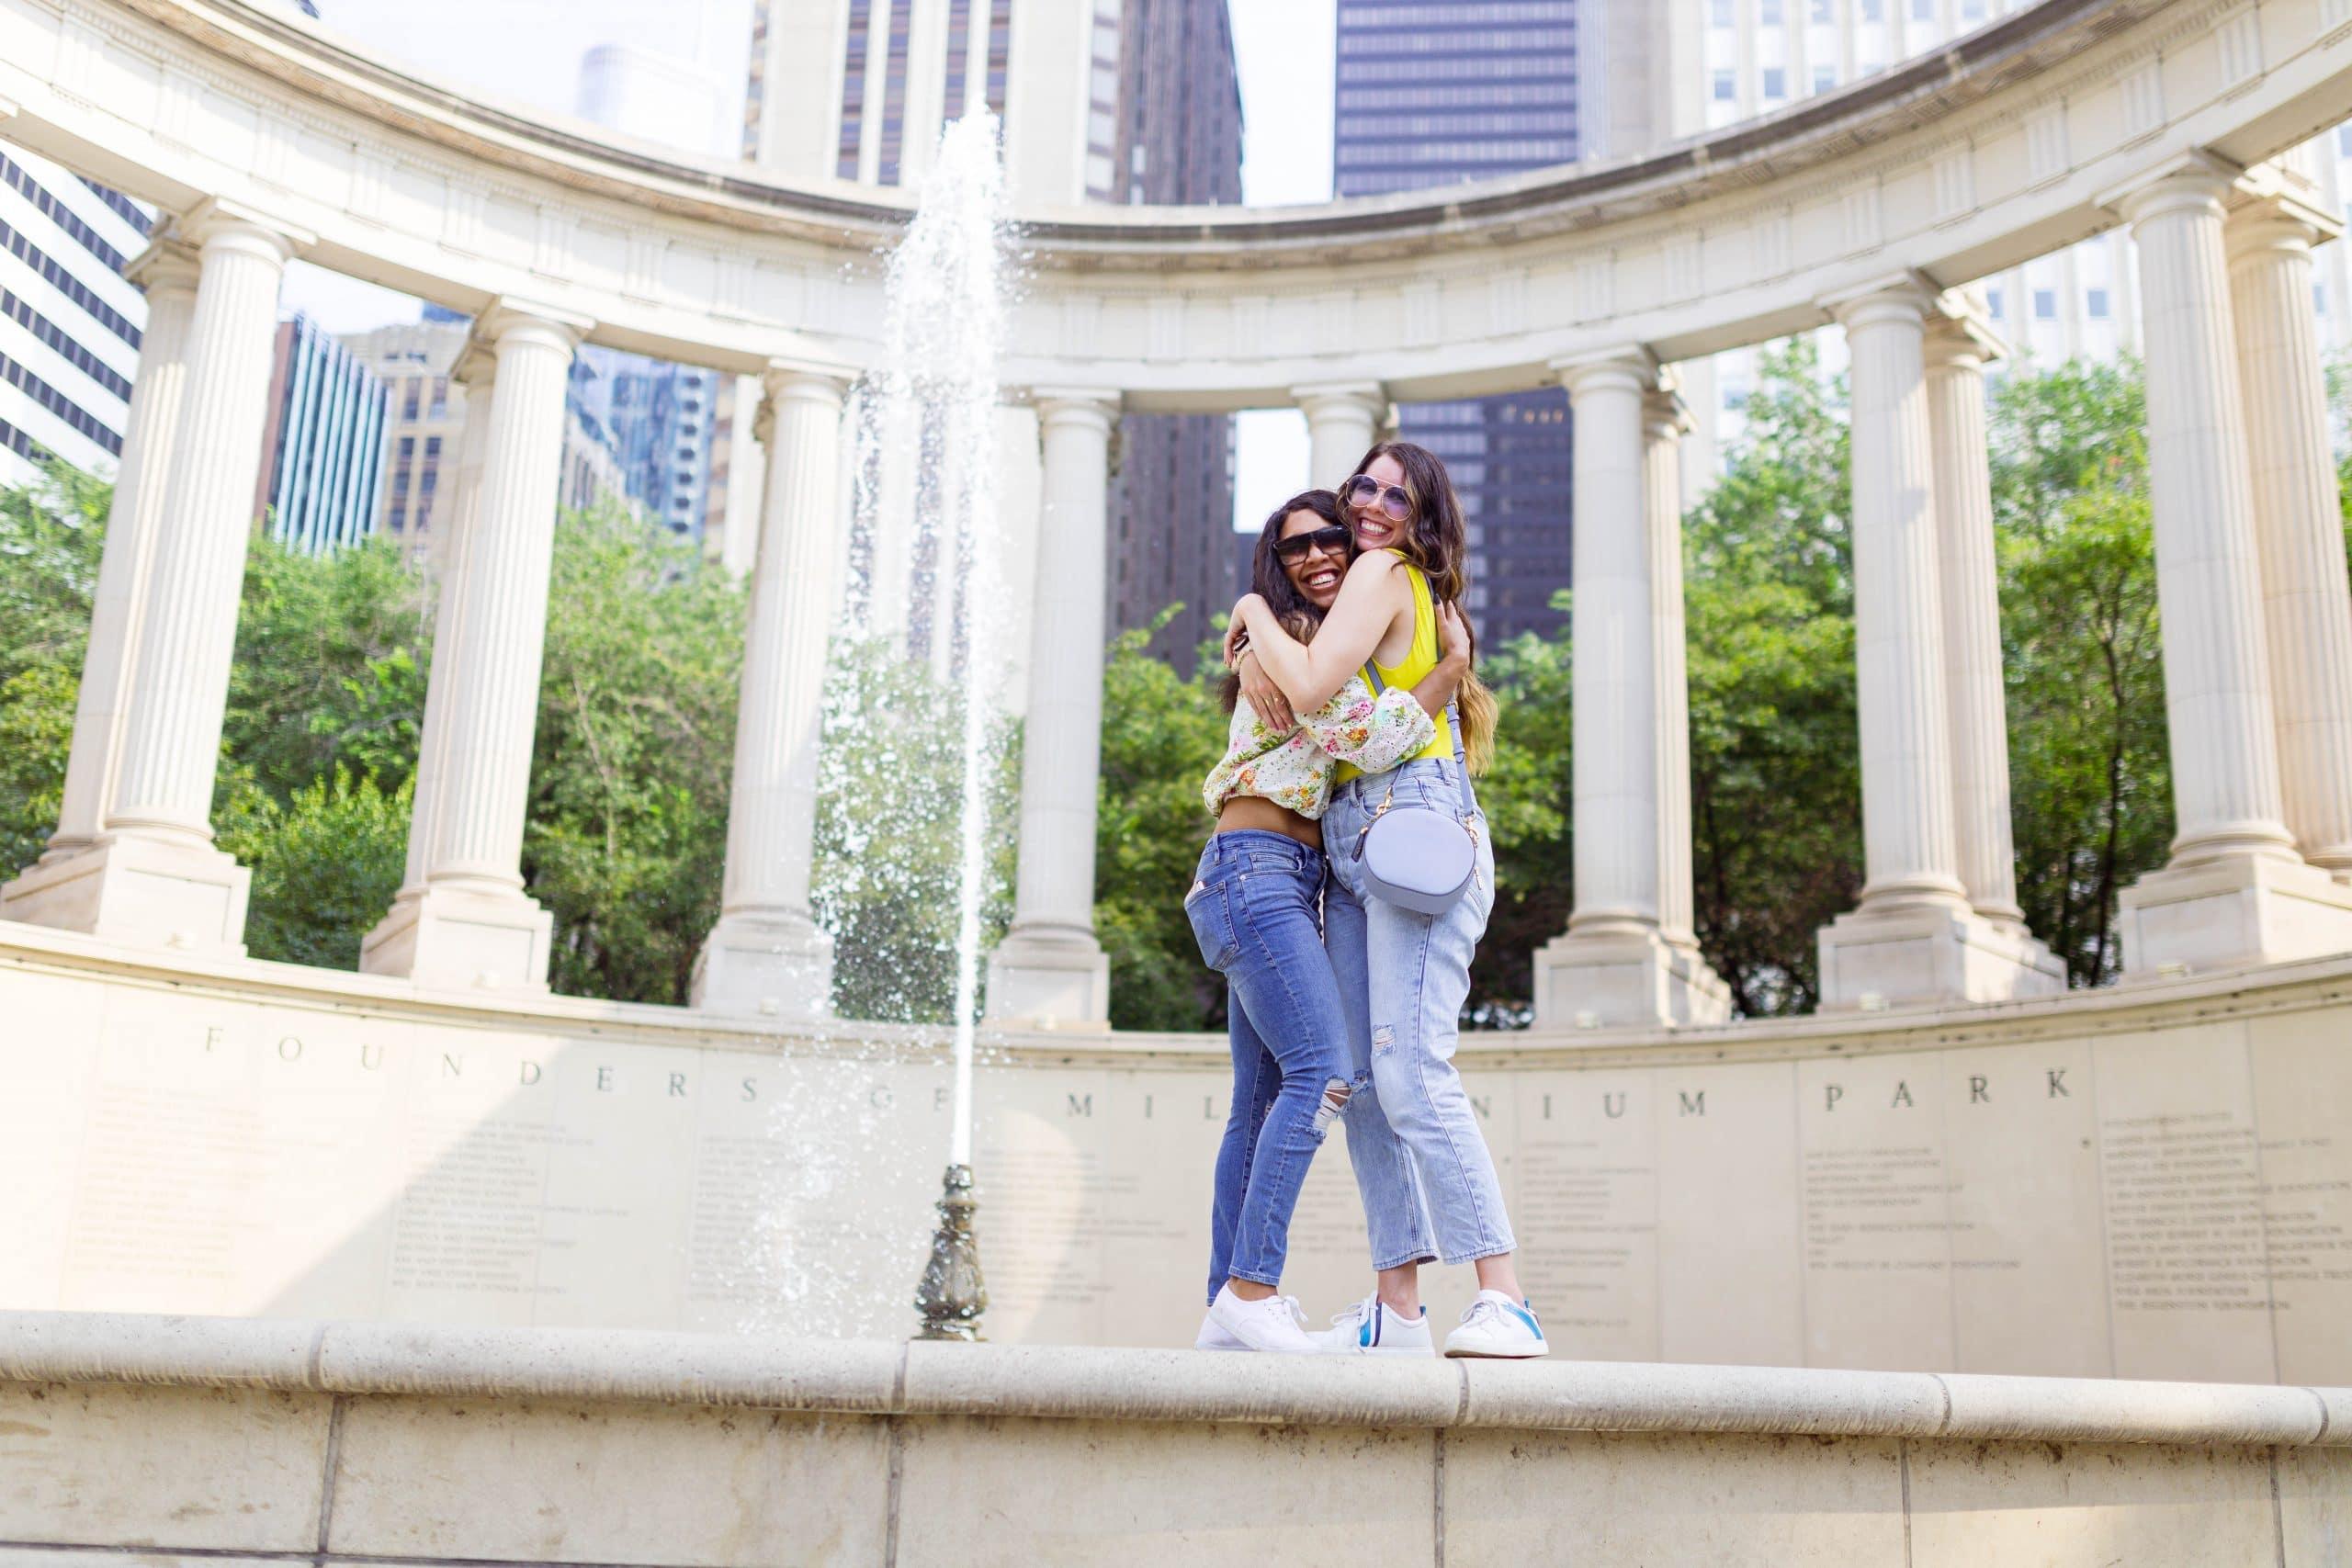 livinglesh chicago fountain